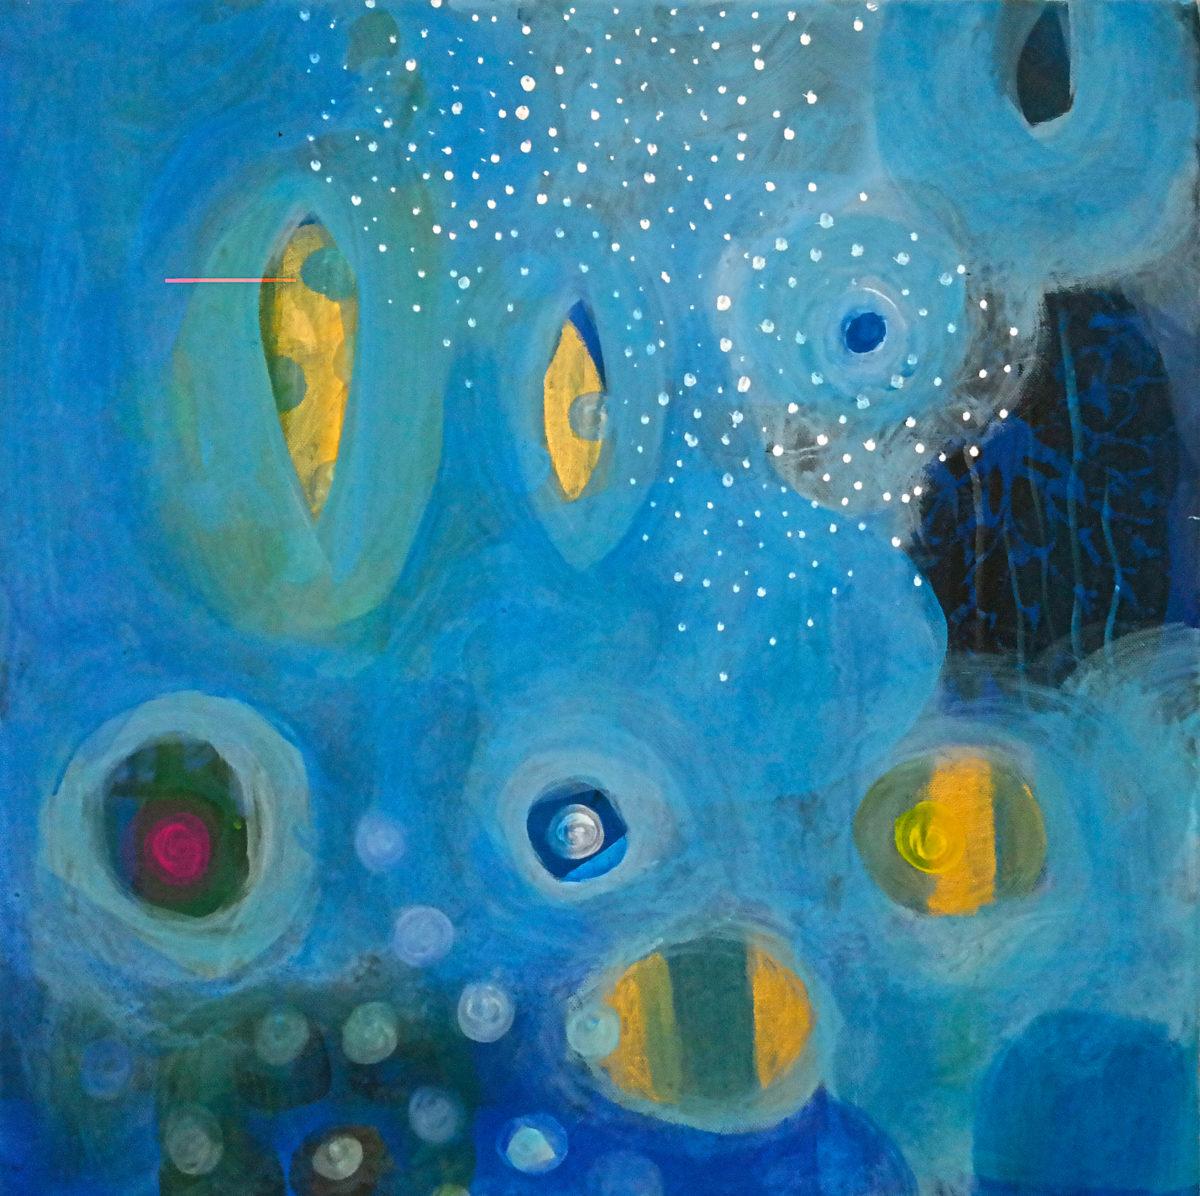 MVS, Spirit of Water 2  painting